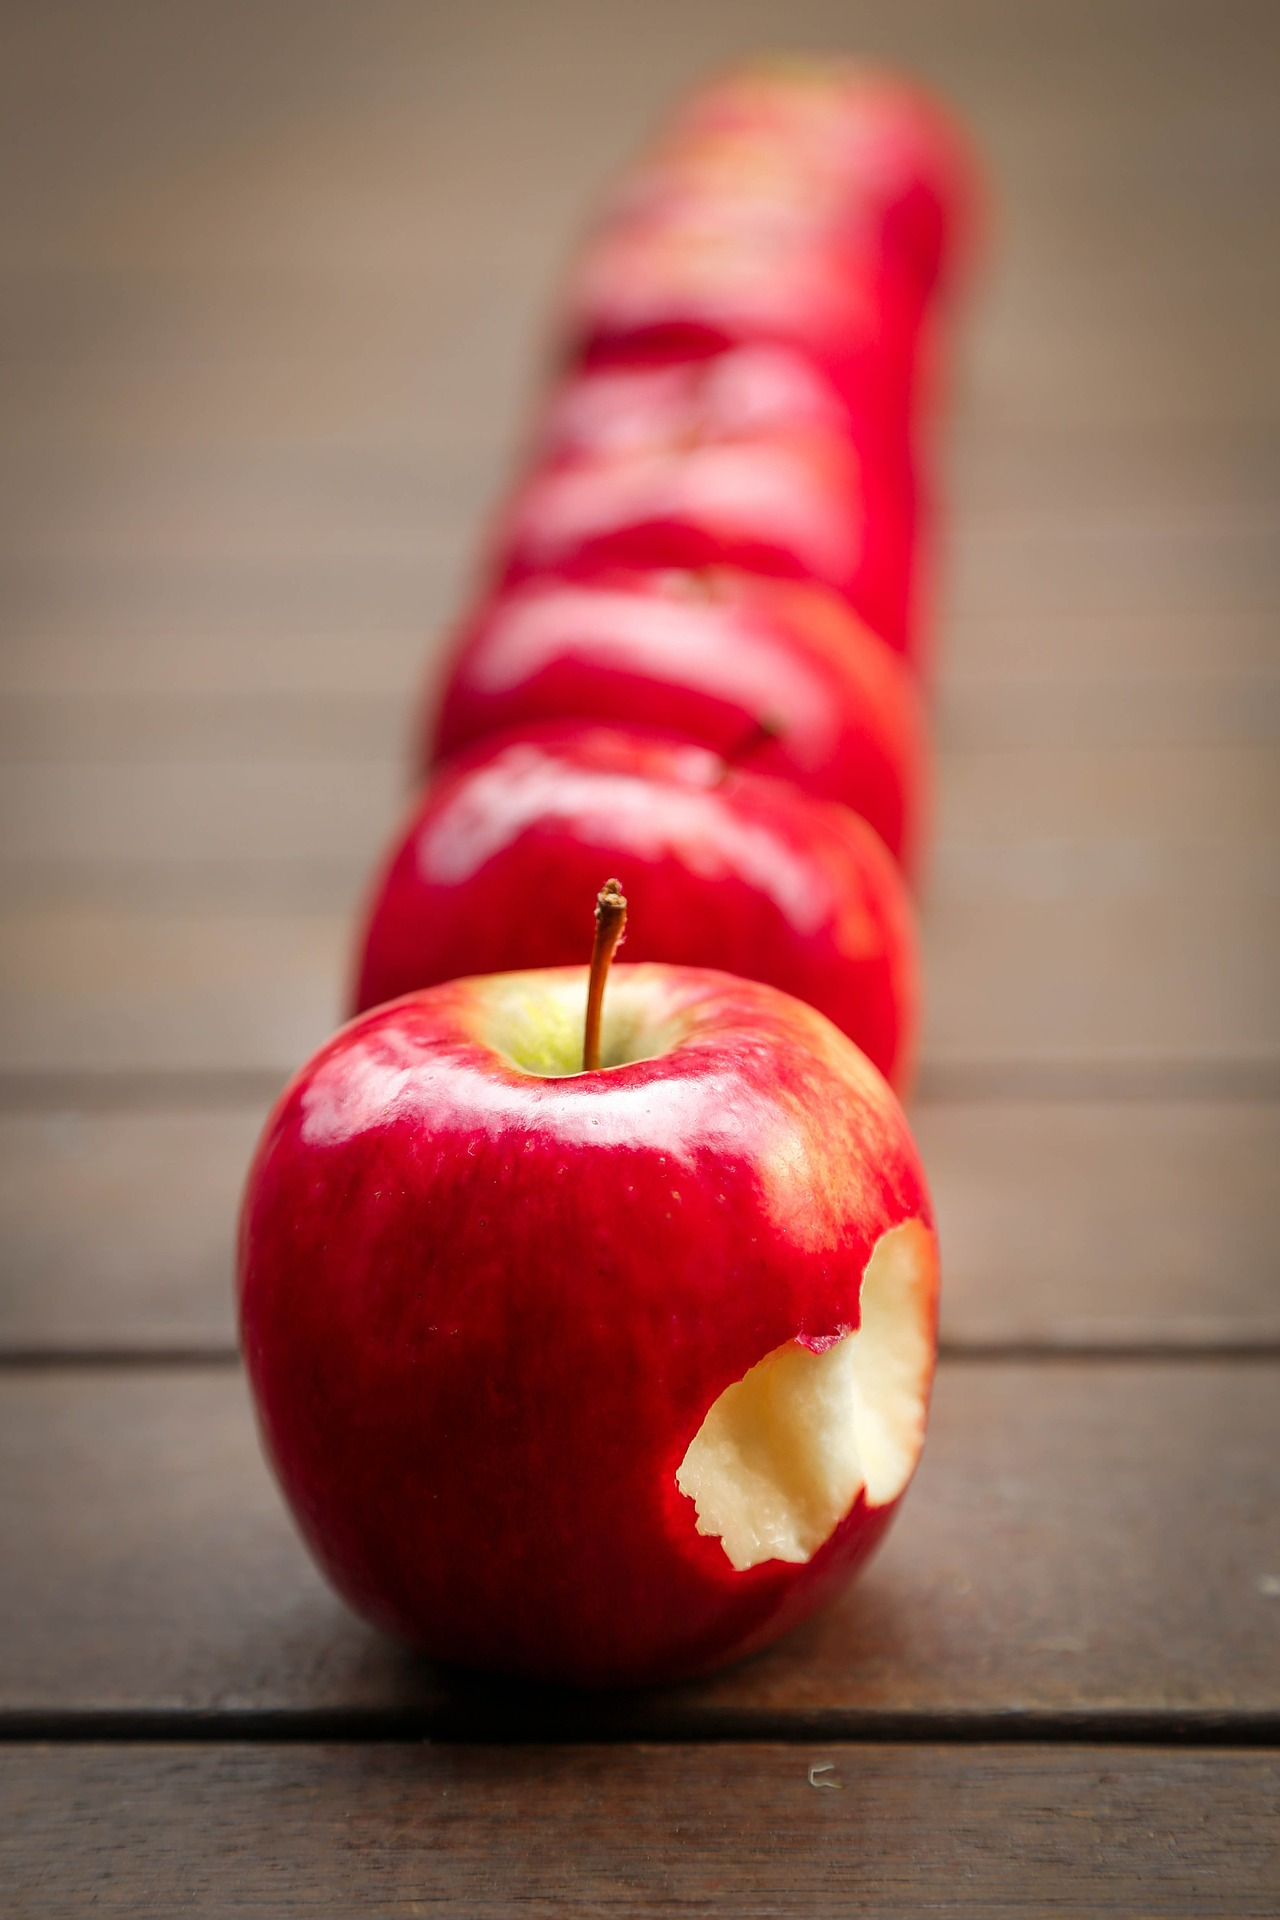 Apples 634572 1920